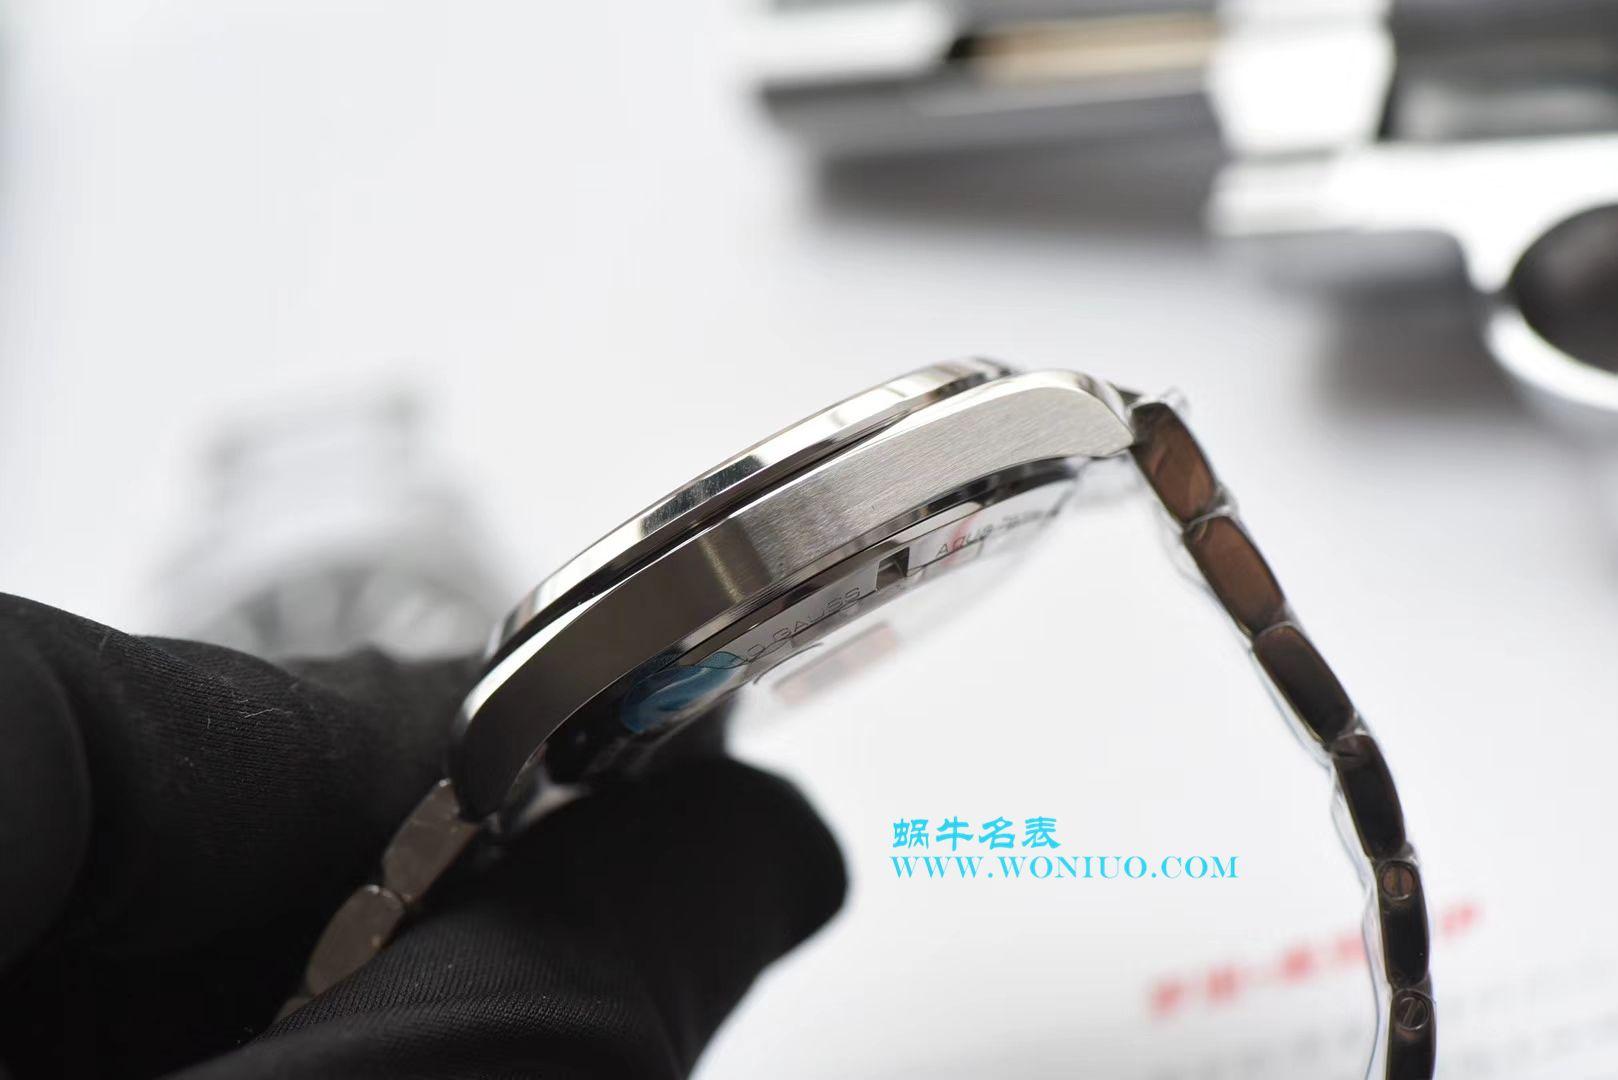 【VS一比一超A复刻手表】欧米茄海马系列231.10.42.21.01.004腕表 / M353